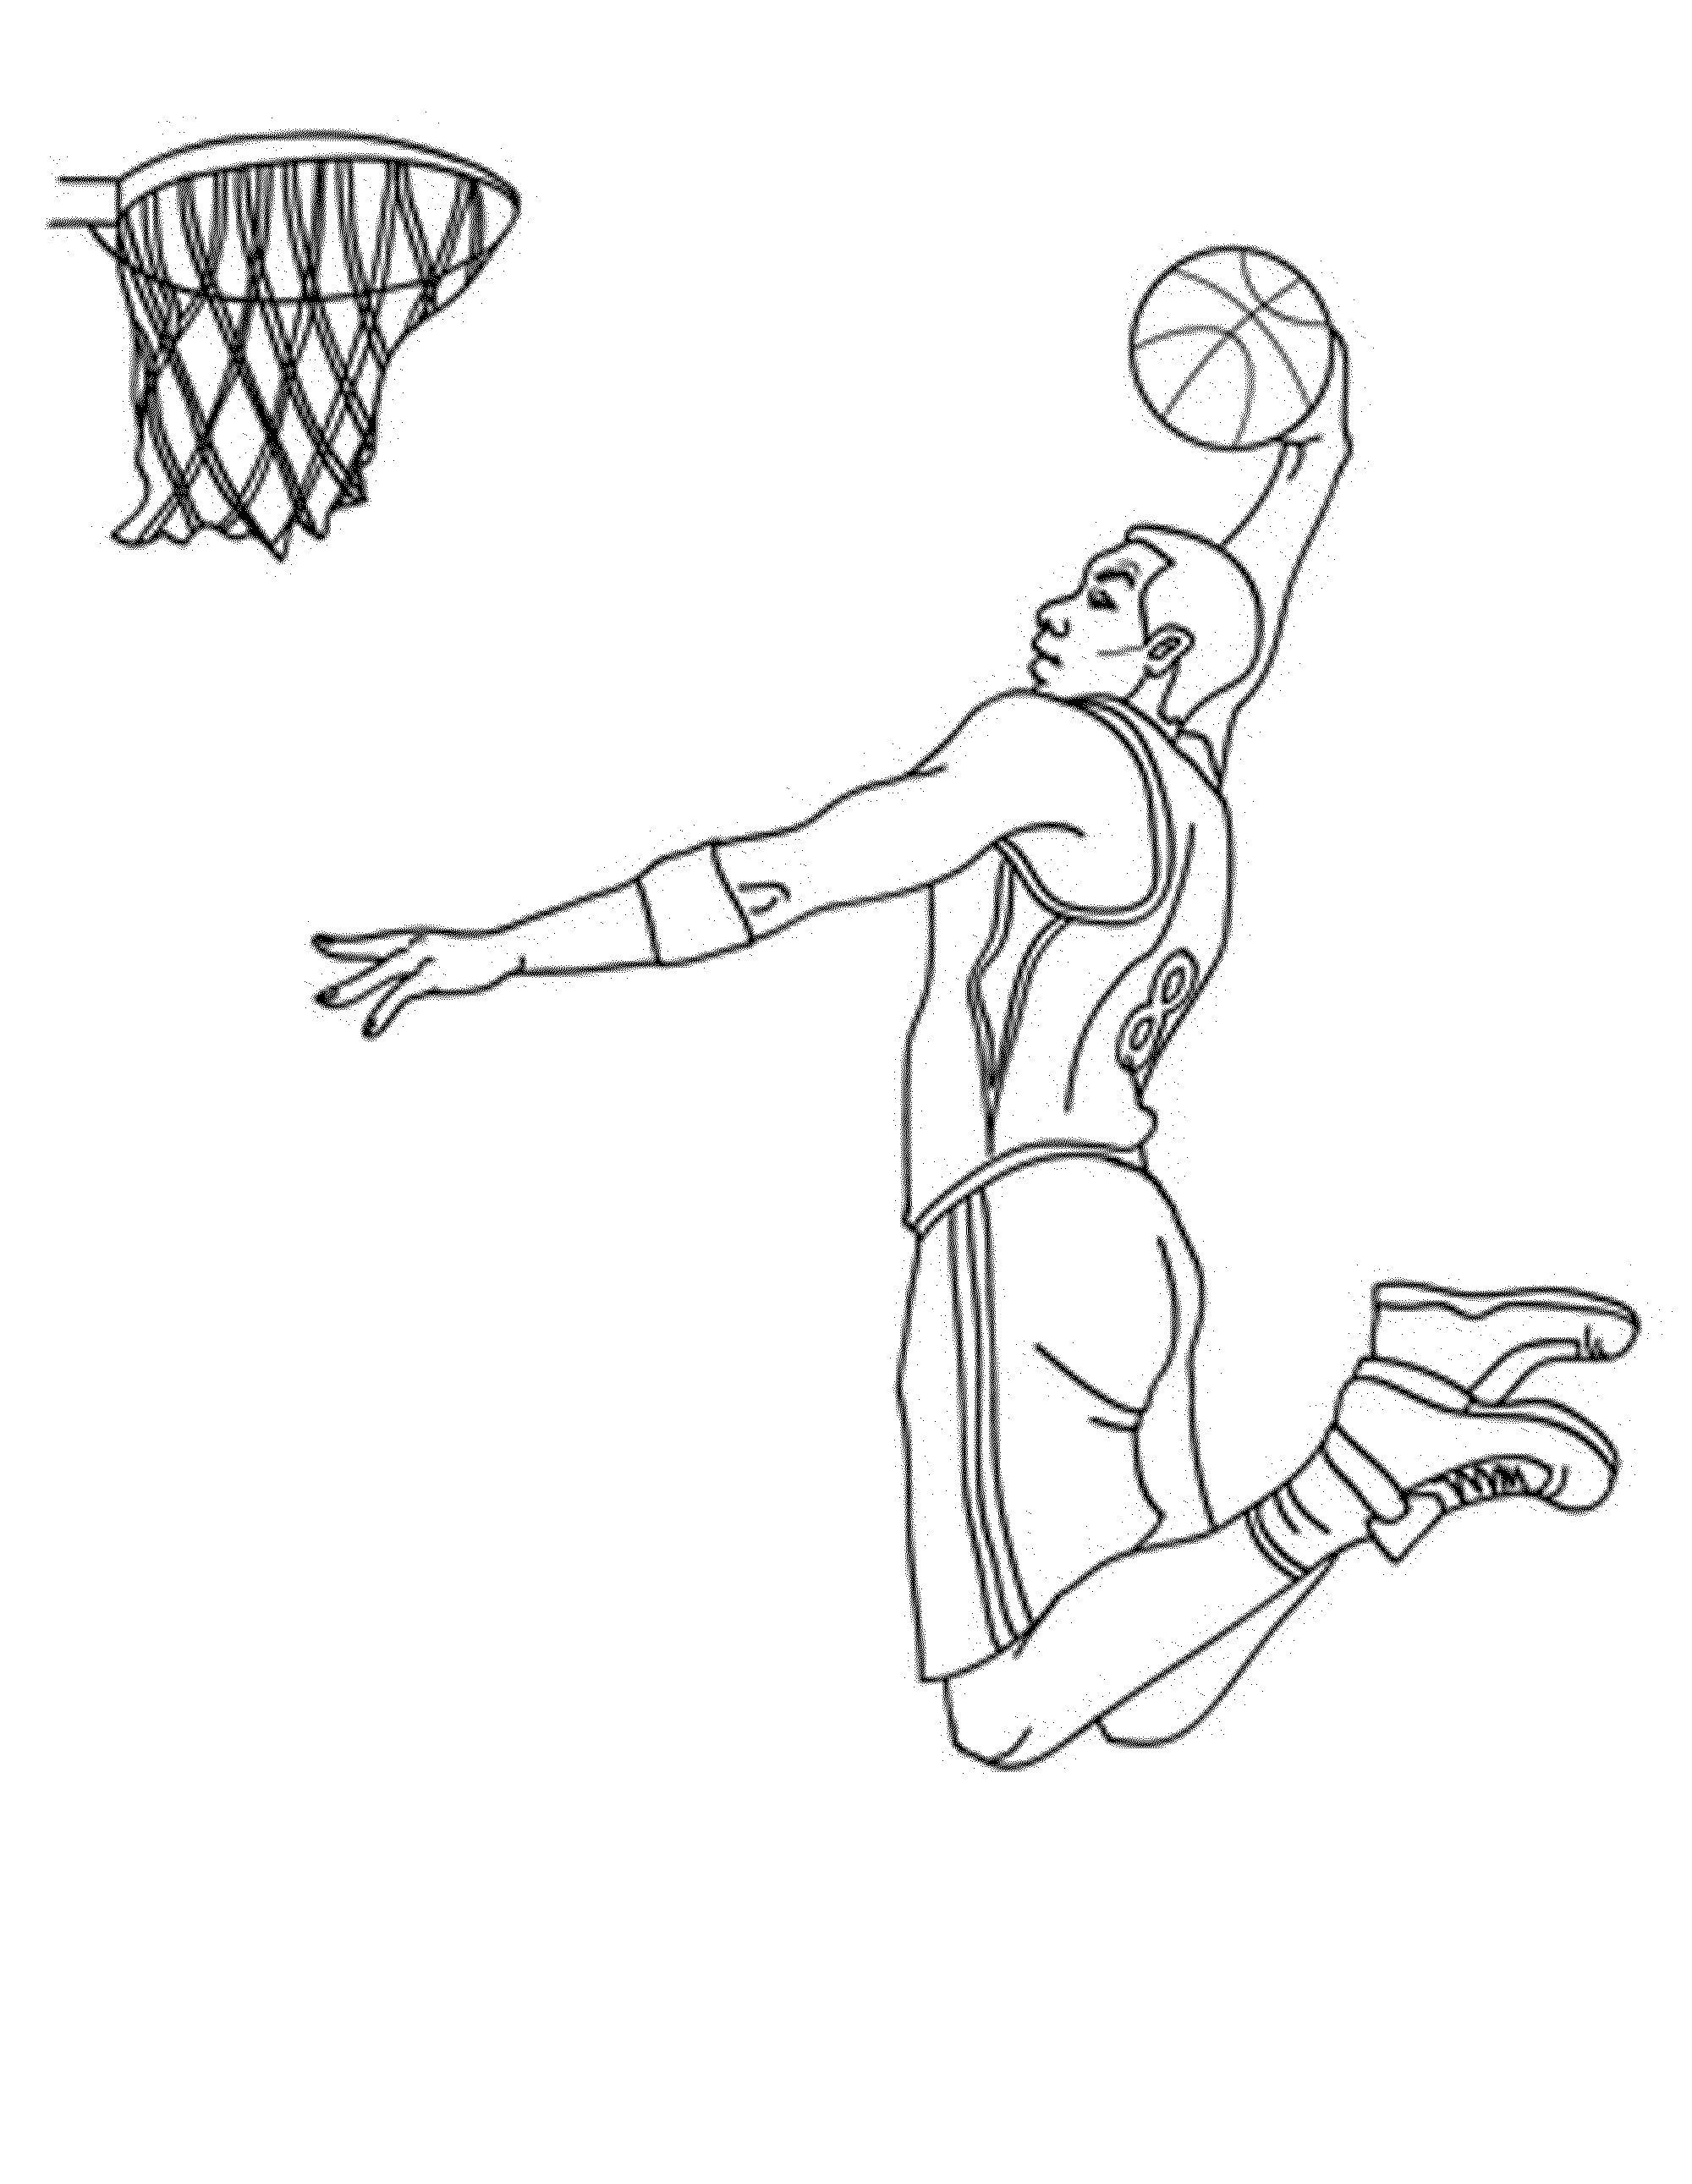 Lebron James Coloring Pages Nba Coloring Pages Of Lebron James Fresh Printable Best Bltidm Leri Entitlementtrap Com Sports Drawings Cute Drawings Lebron James